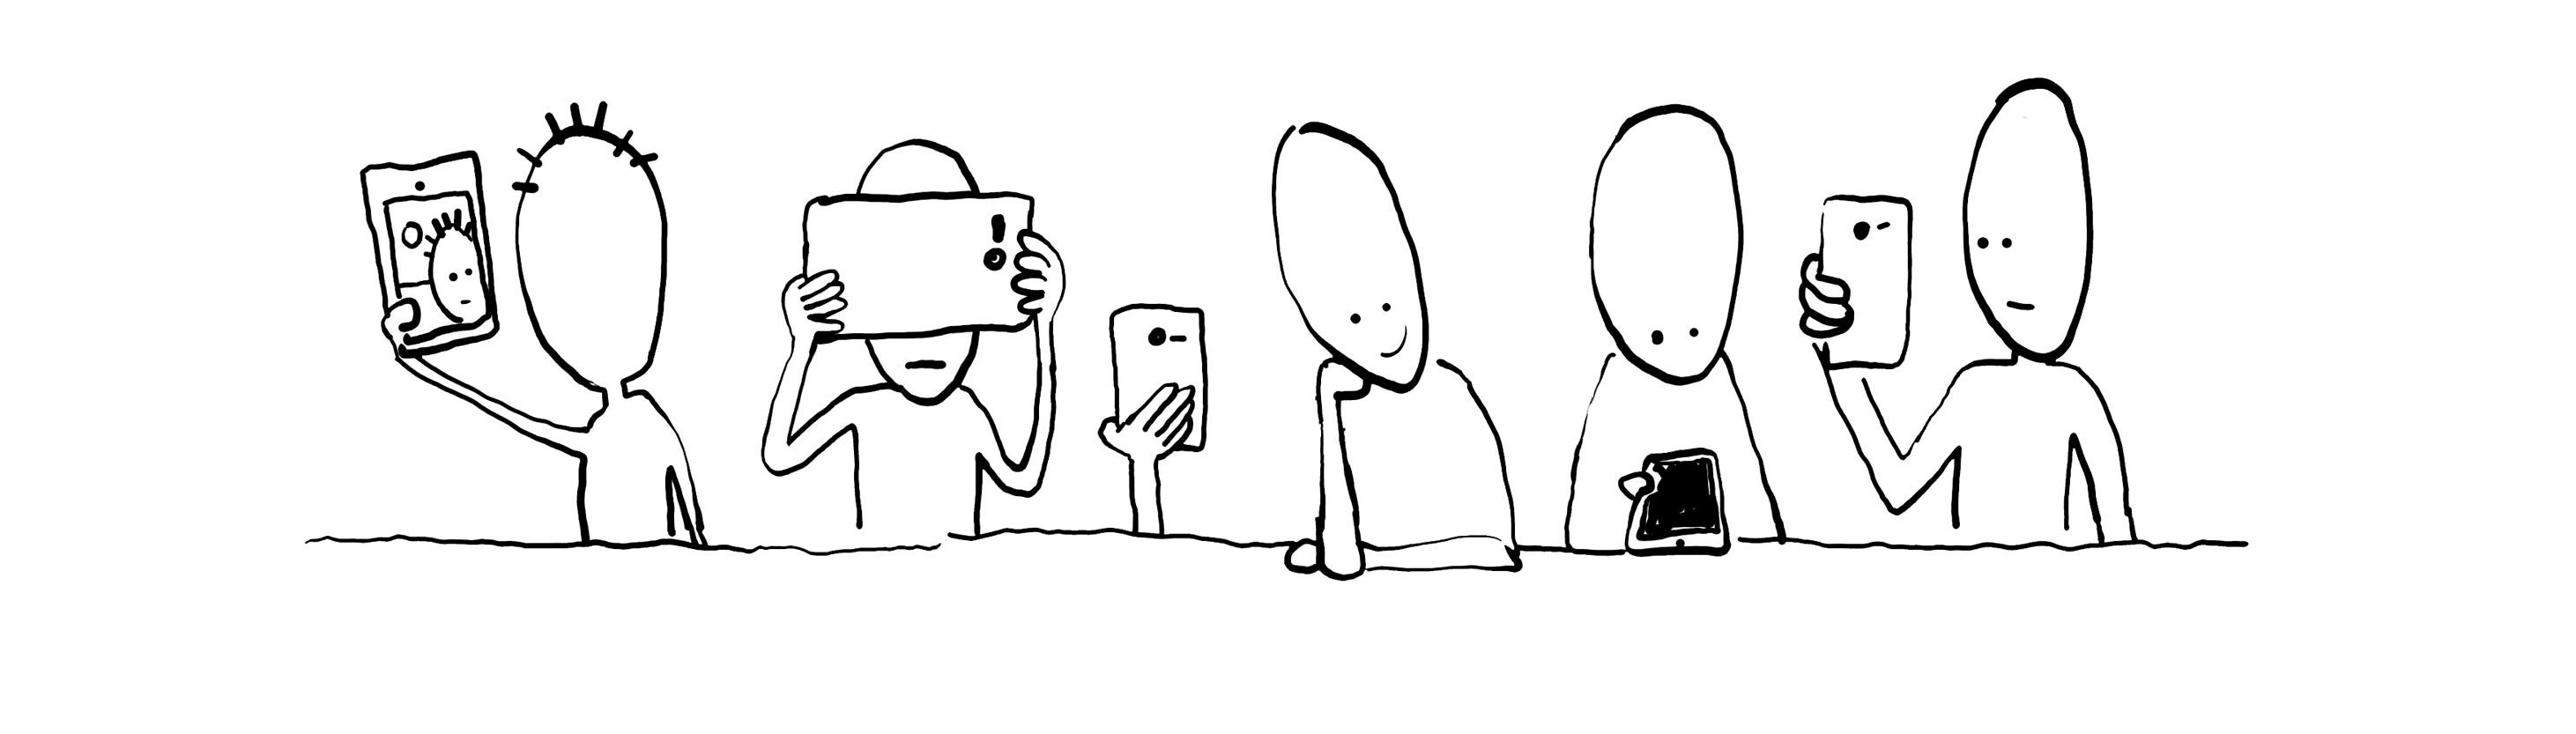 Karikatur: Thomas Selinger. www.seli.at